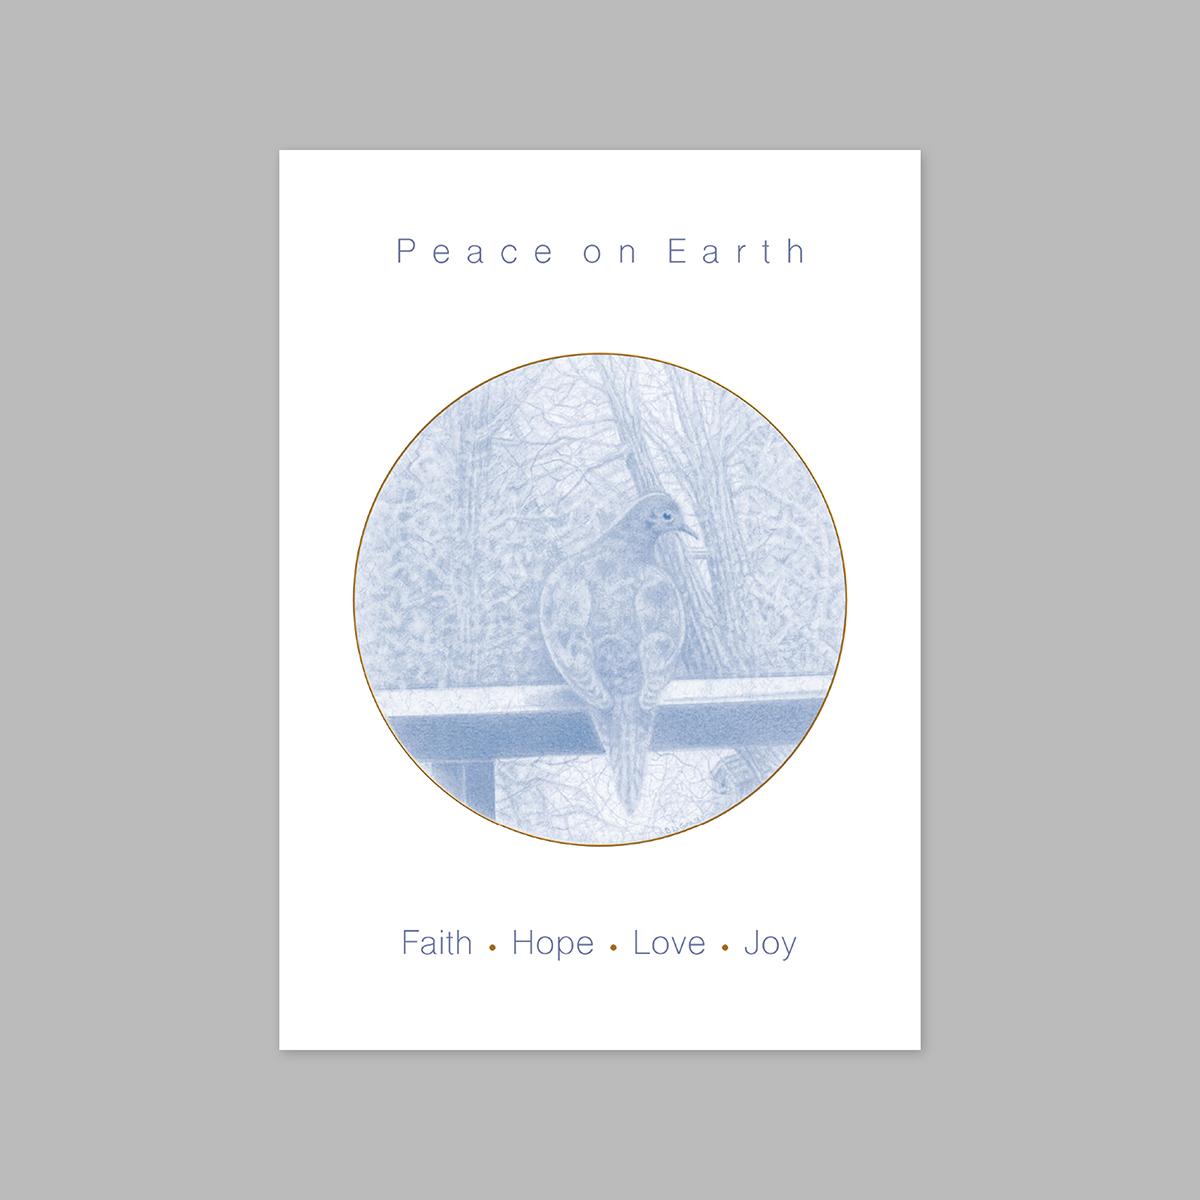 Peace on Earth by Barbara Gray